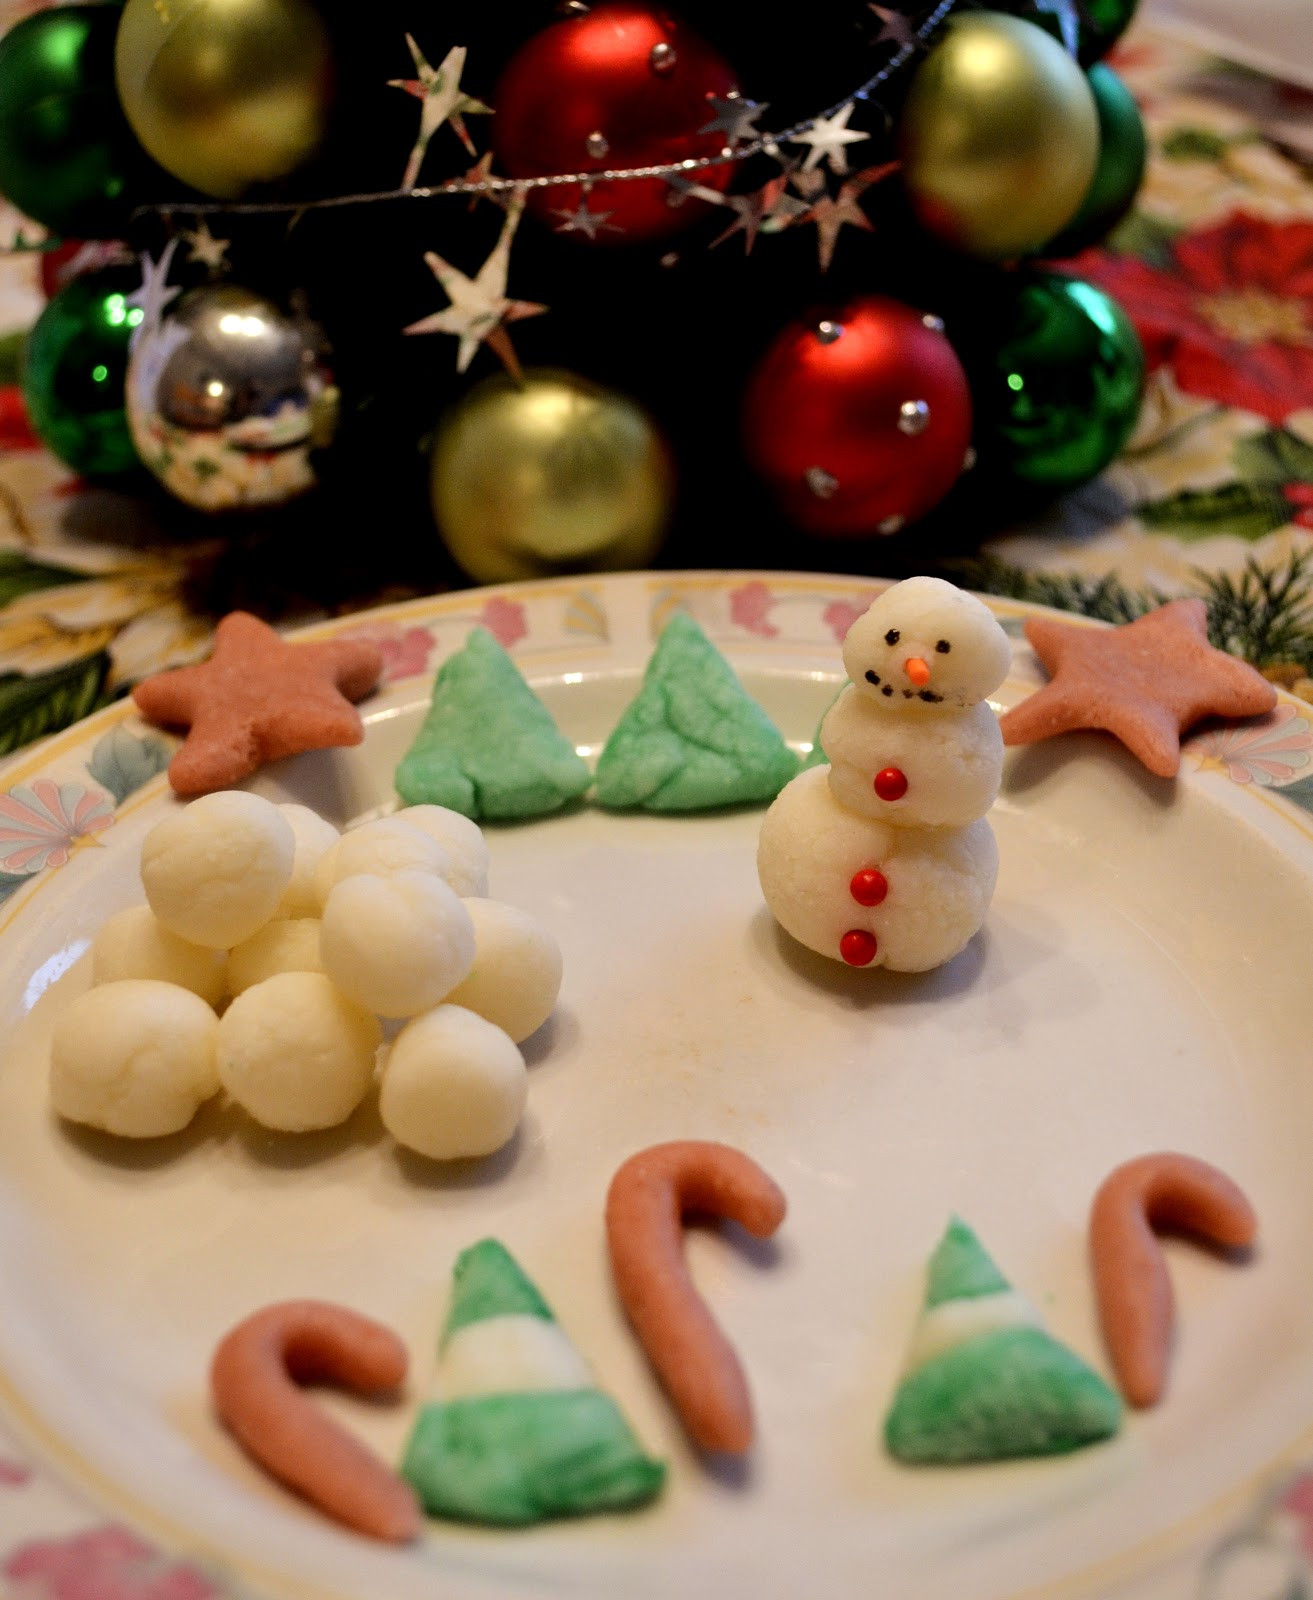 Christmas Candy Corn  Simple Savory & Satisfying Christmas Candy Corn